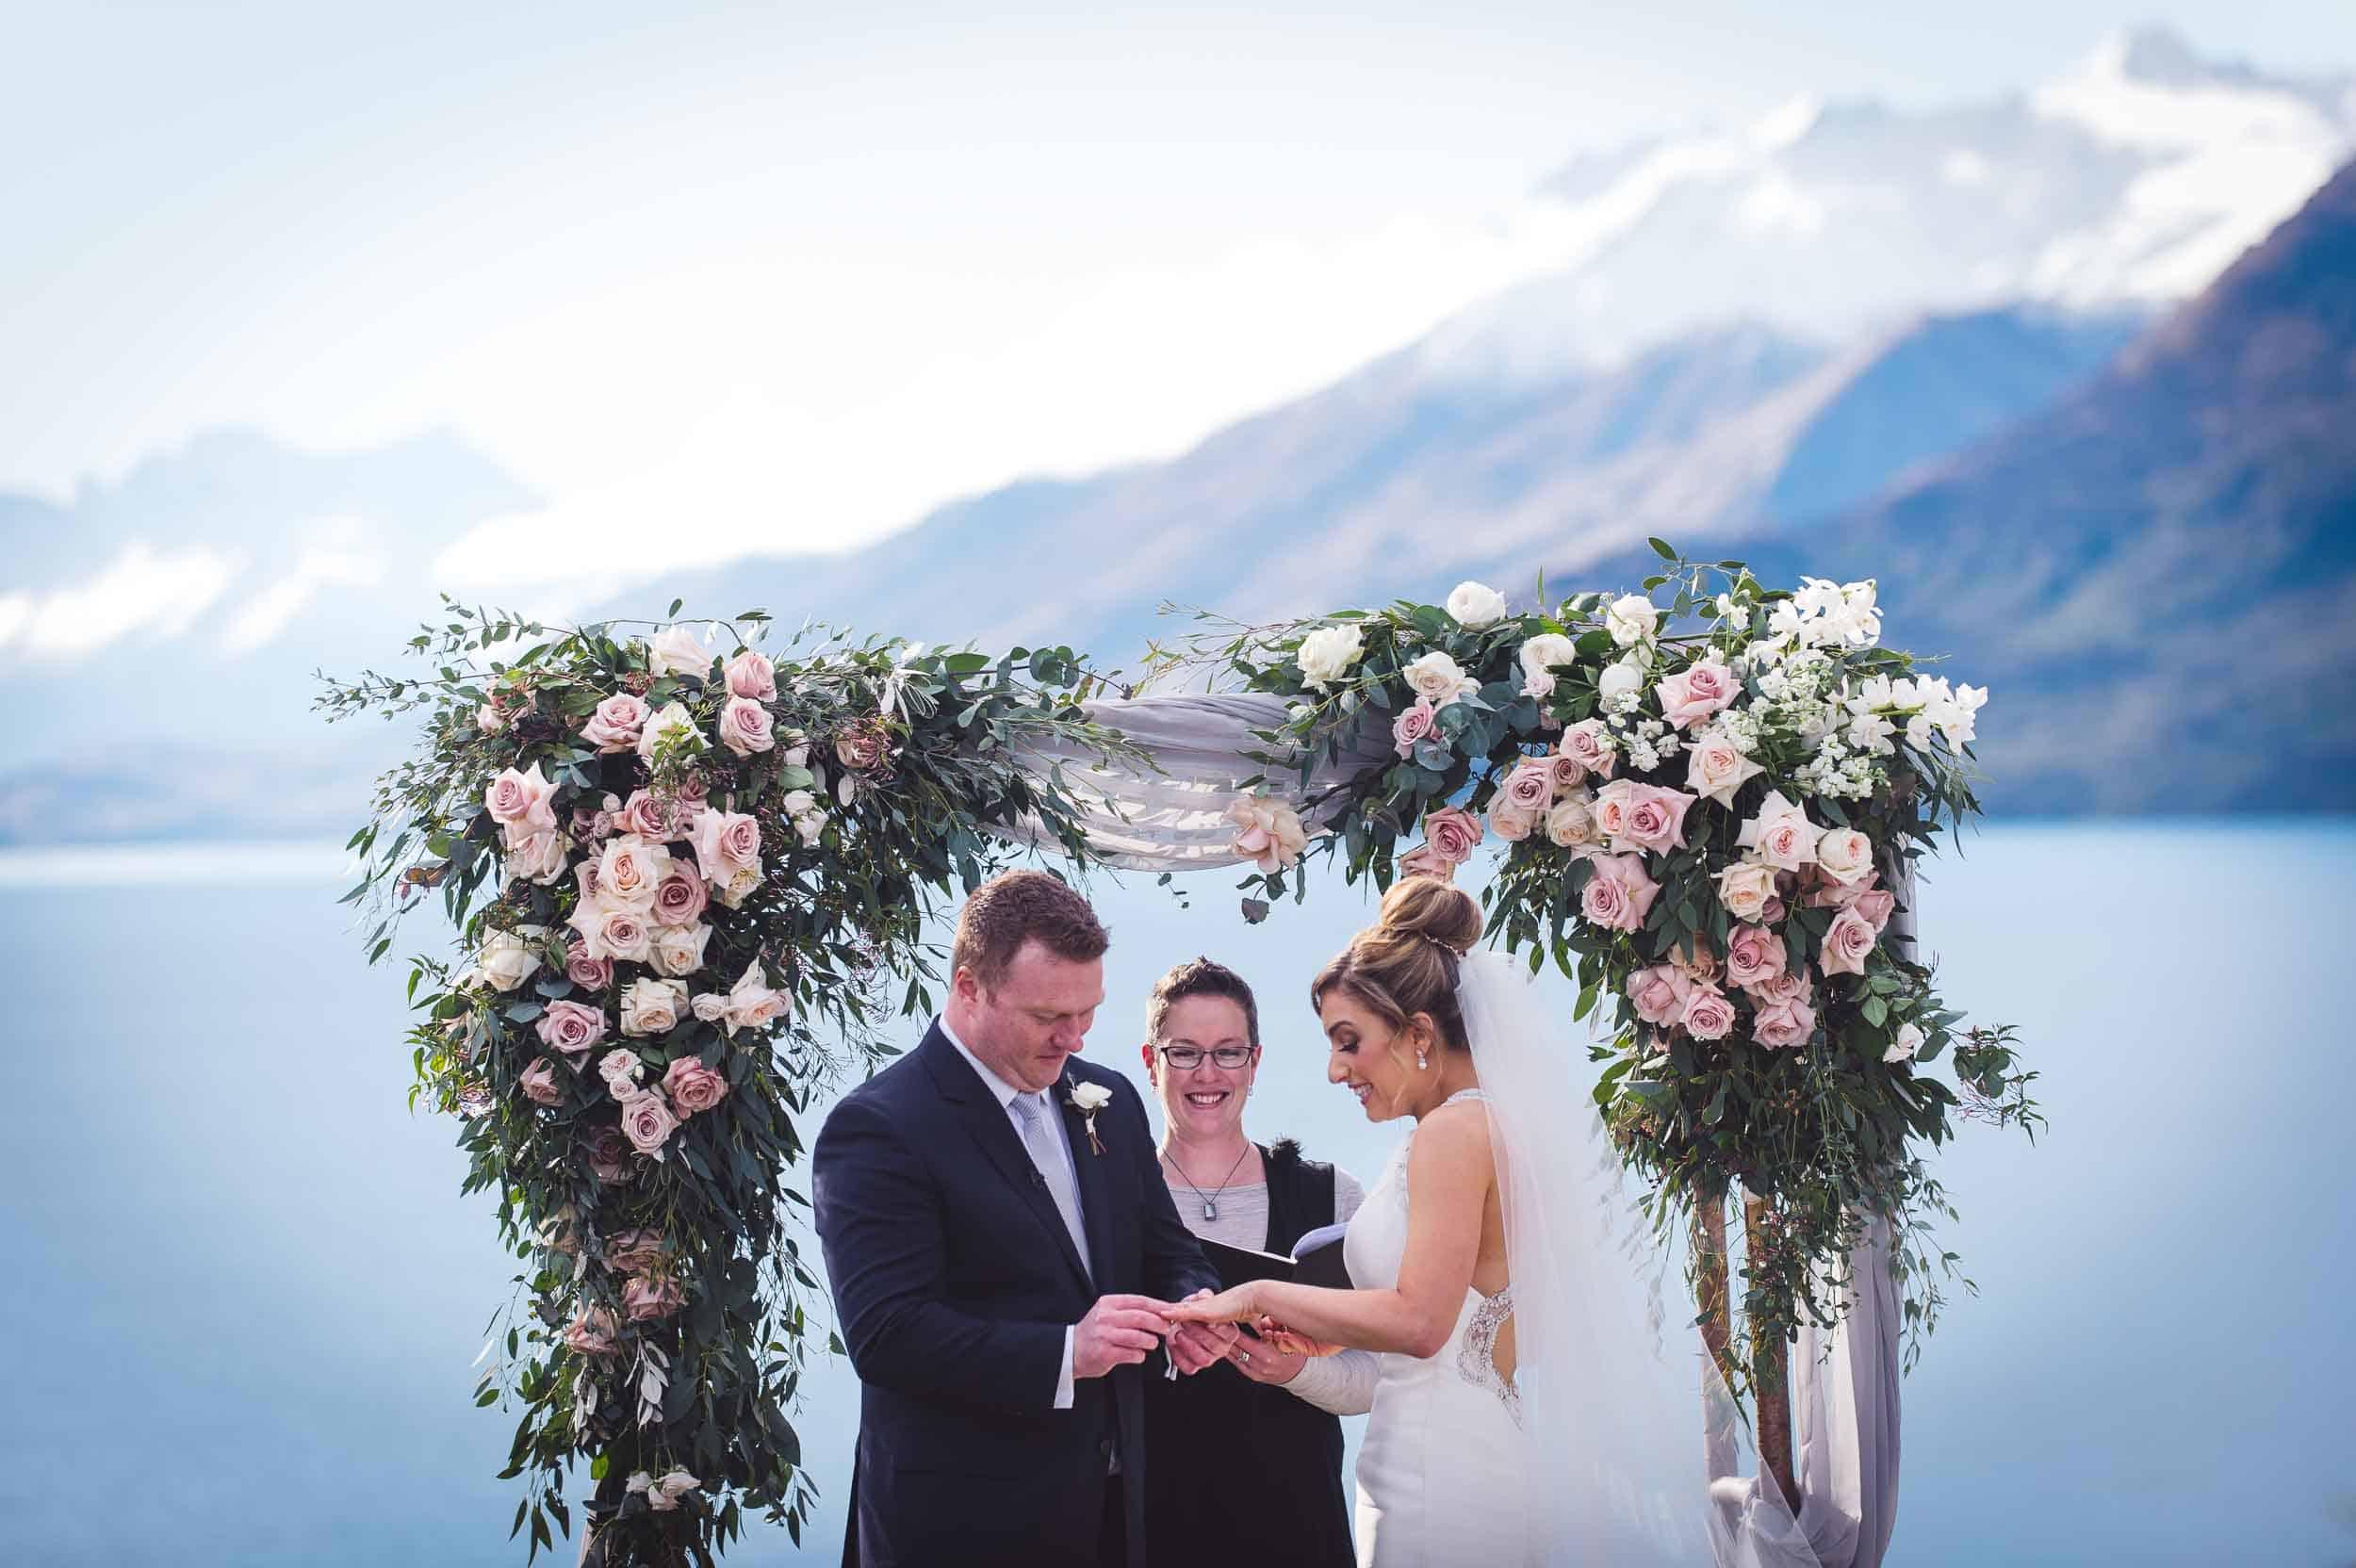 Mount Nicholas Wedding Evanna & Liam's Mount Nicholas Wedding Queenstown Farm wedding fallon photography